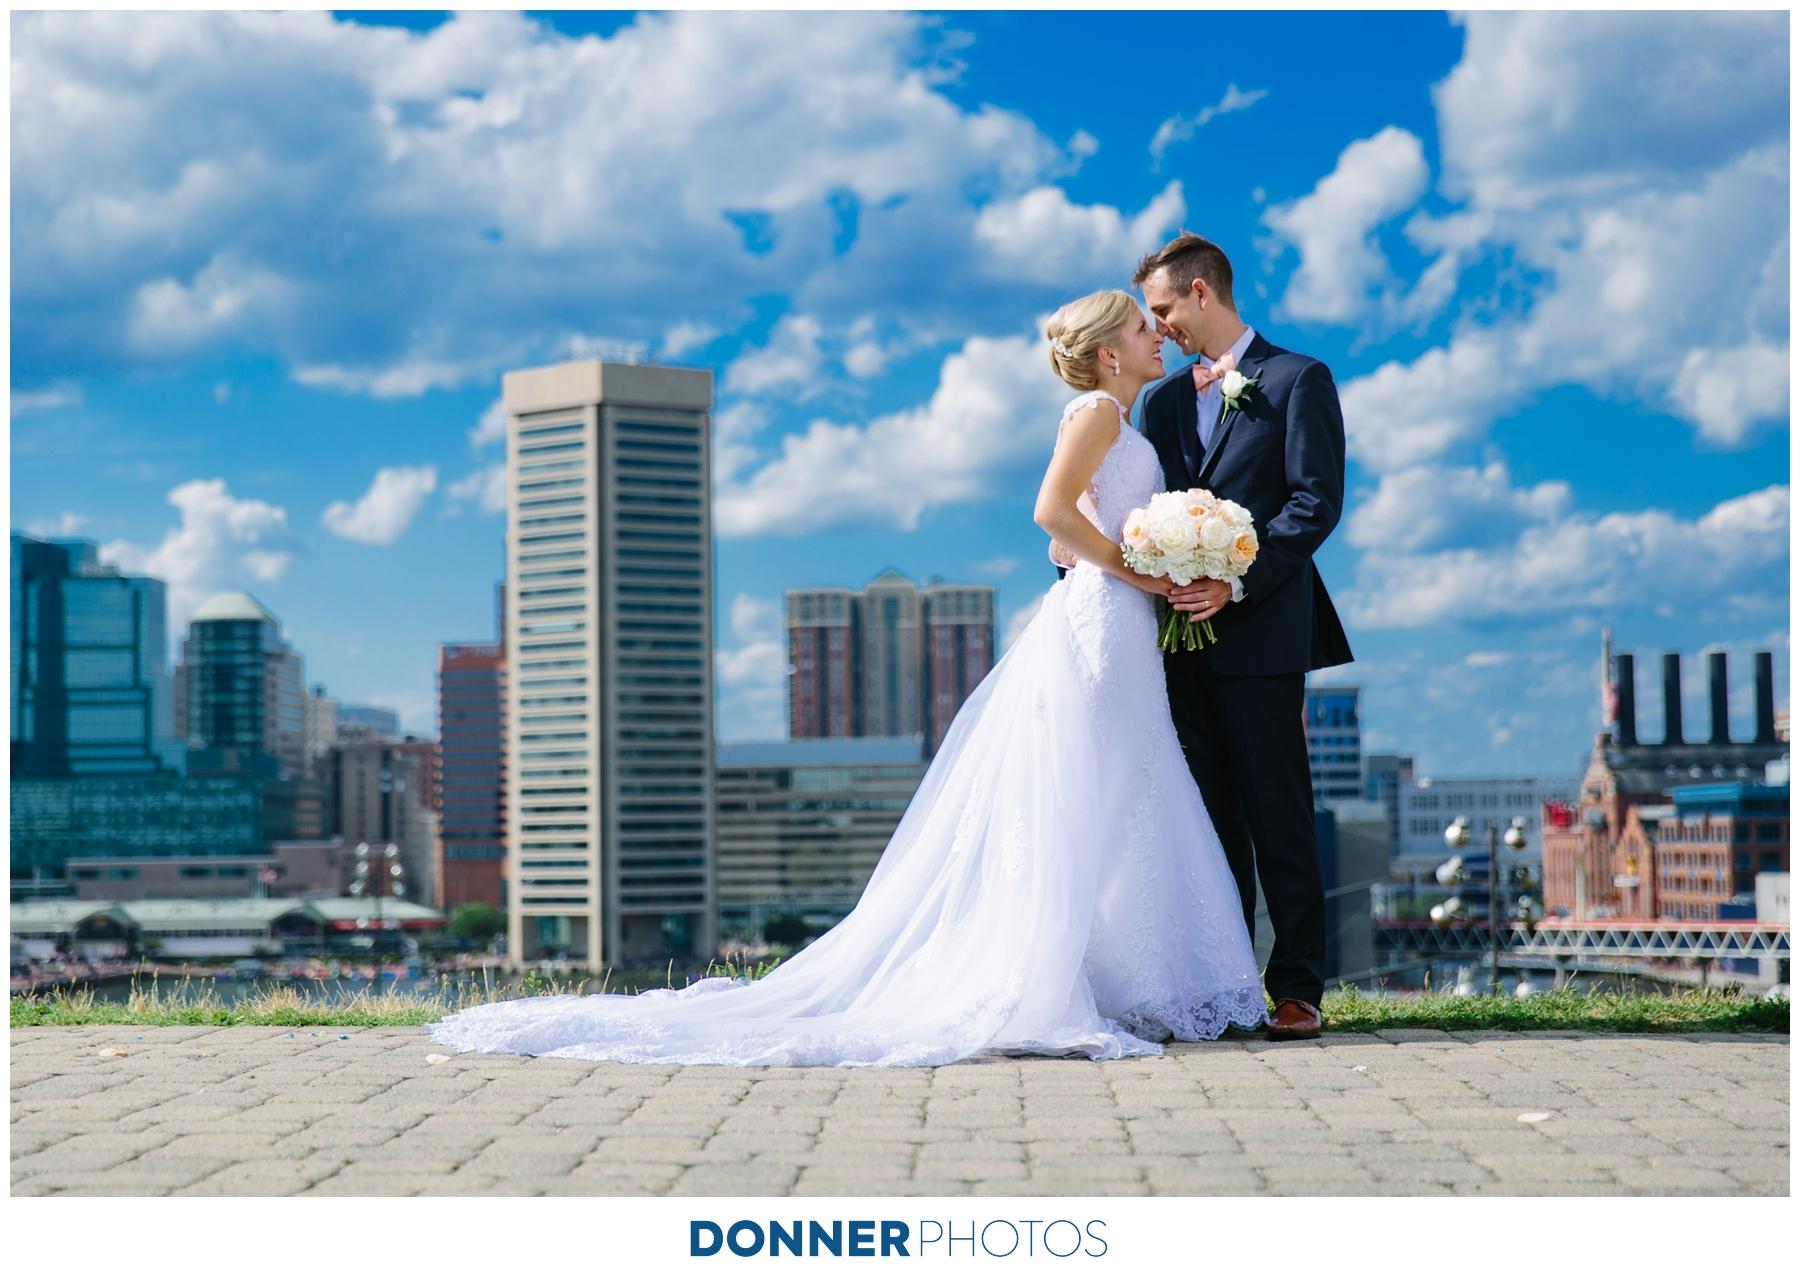 BALTIMORE MARYLAND WEDDING: ERIN & GREG